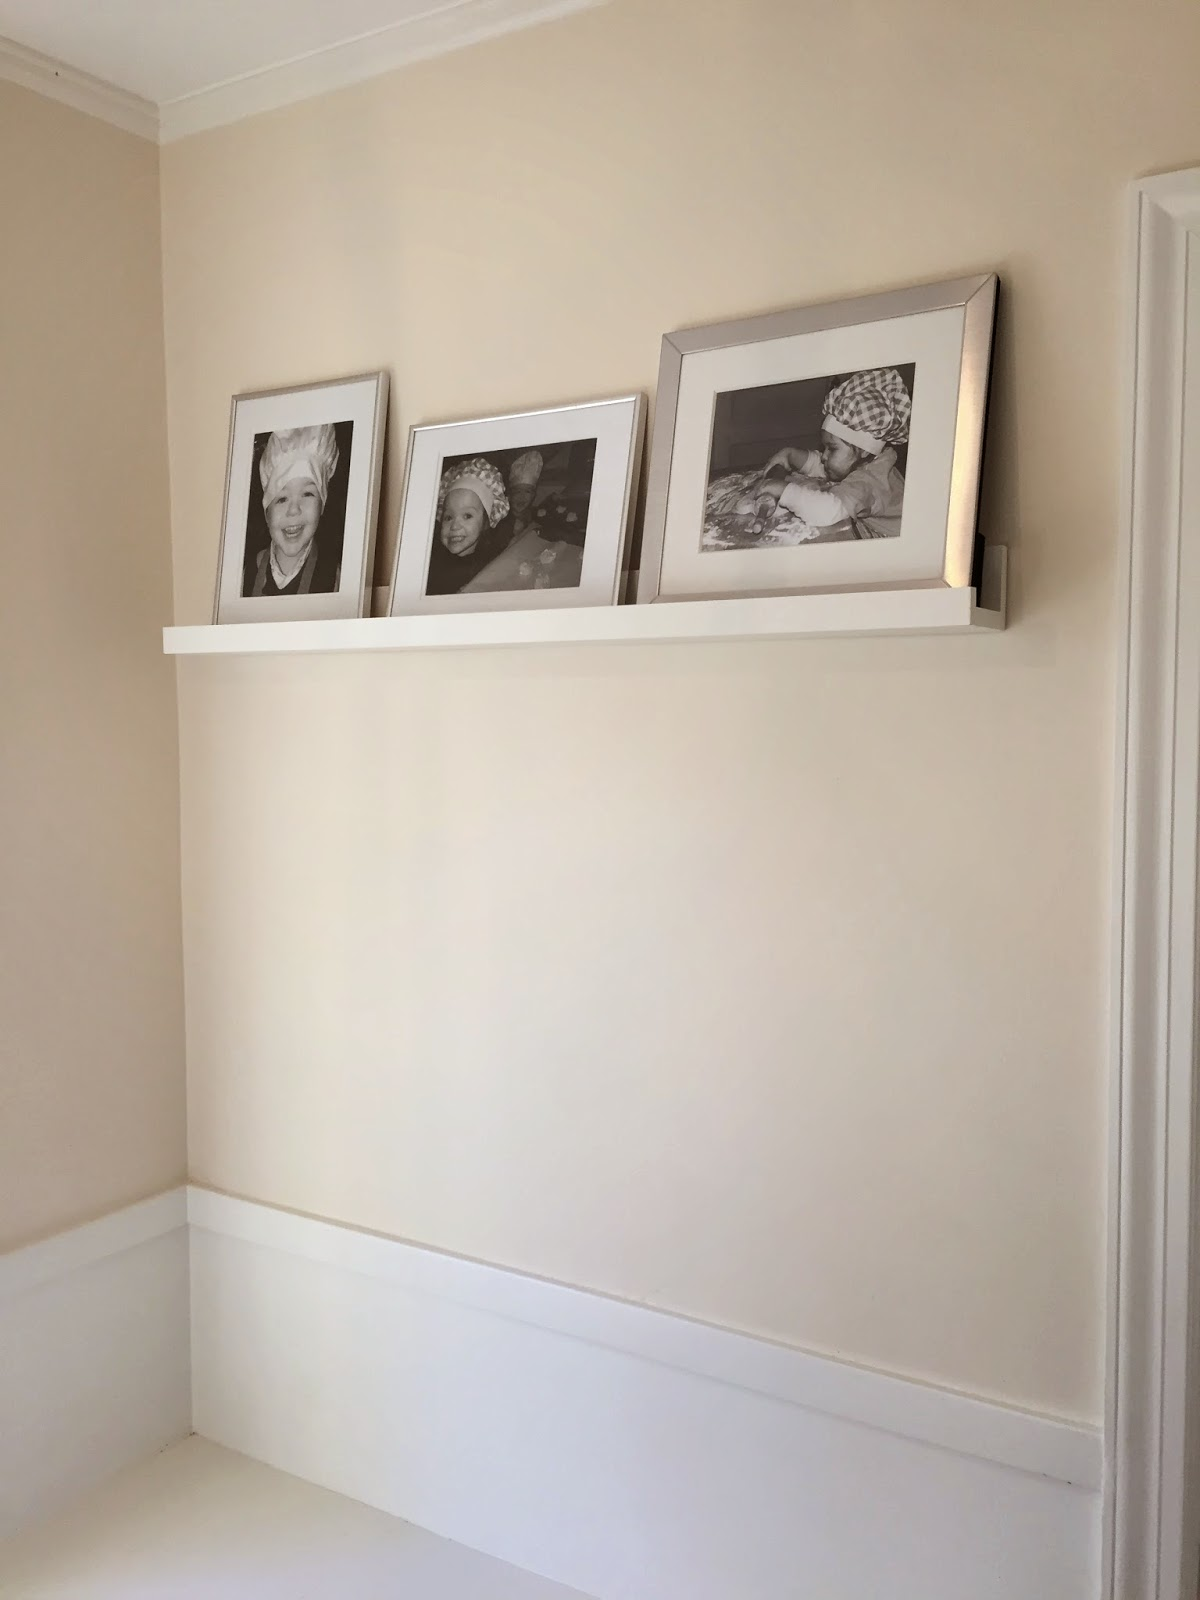 How to make a gallery ledge - how to build a photo shelf